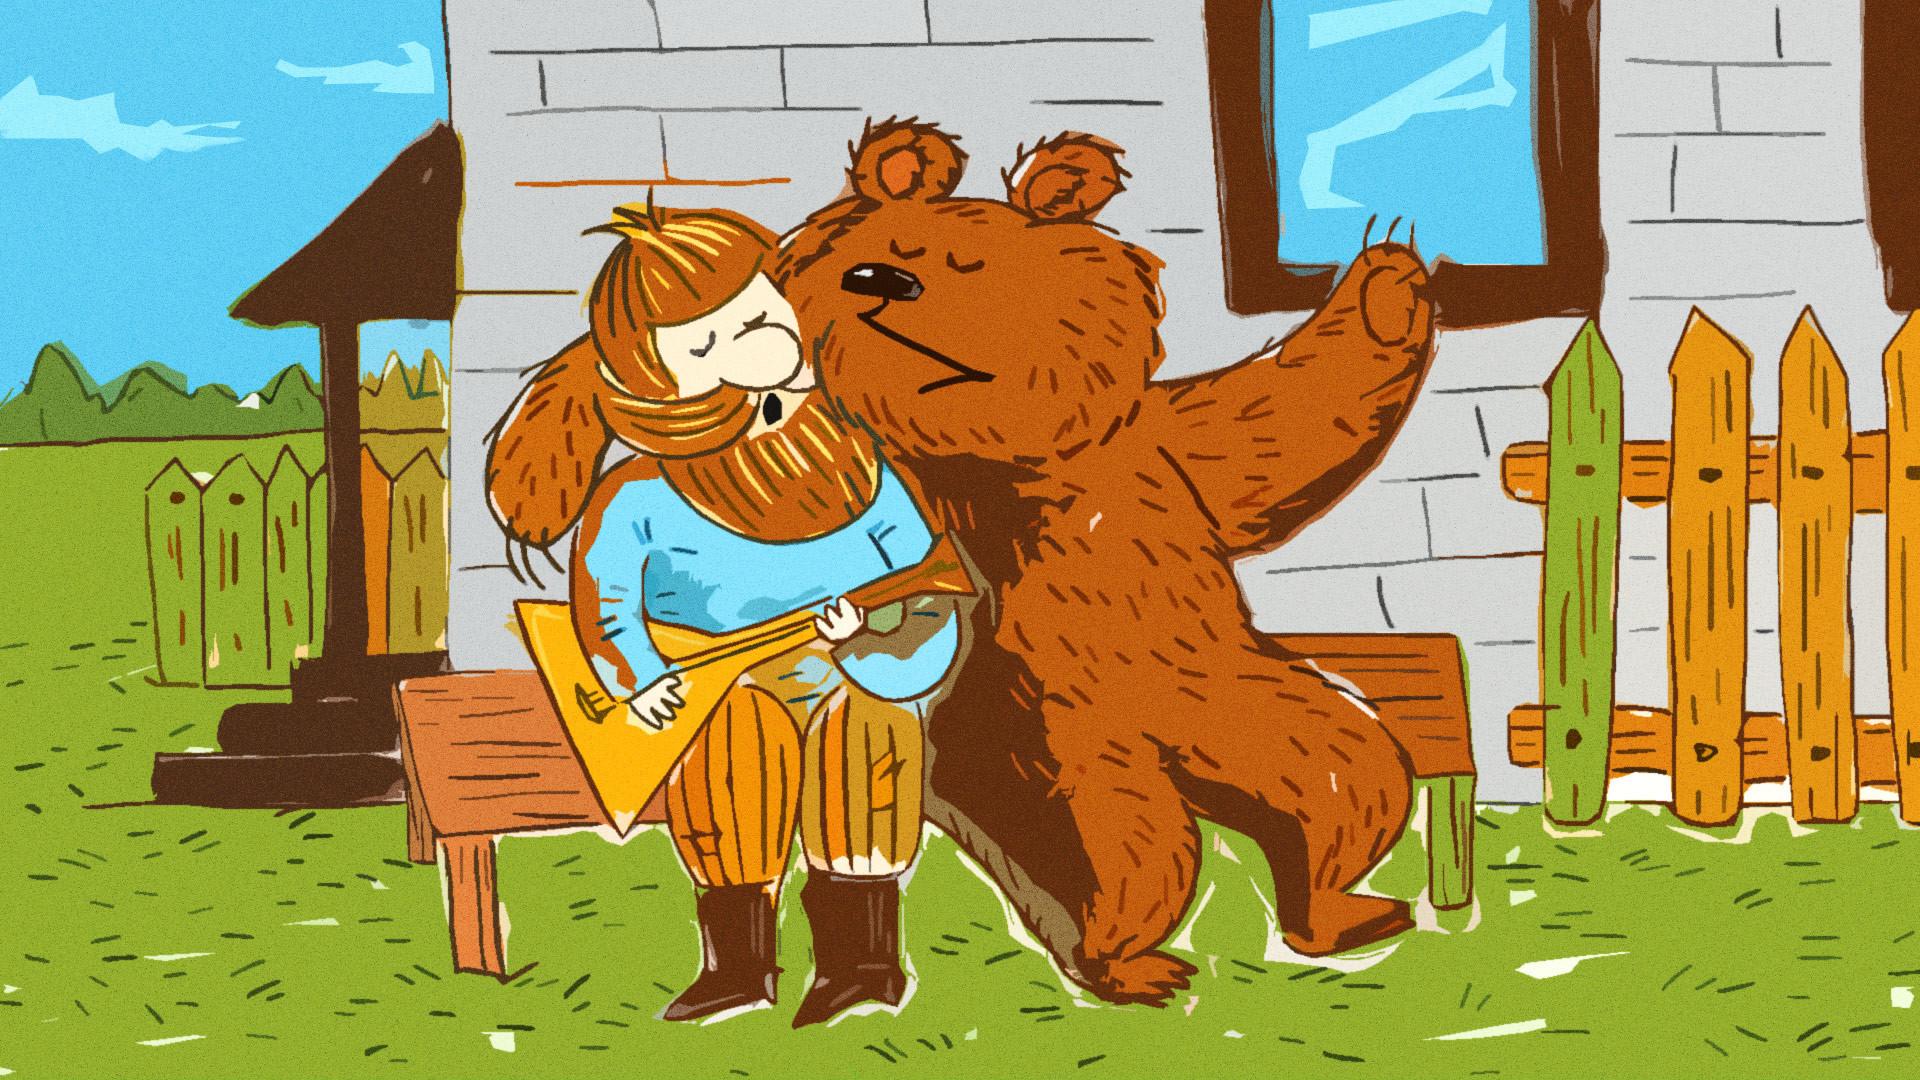 Rasa tak kenal takut (dan mungkin ditambah alkohol) adalah satu-satunya penjelasan perilaku sembrono orang Rusia